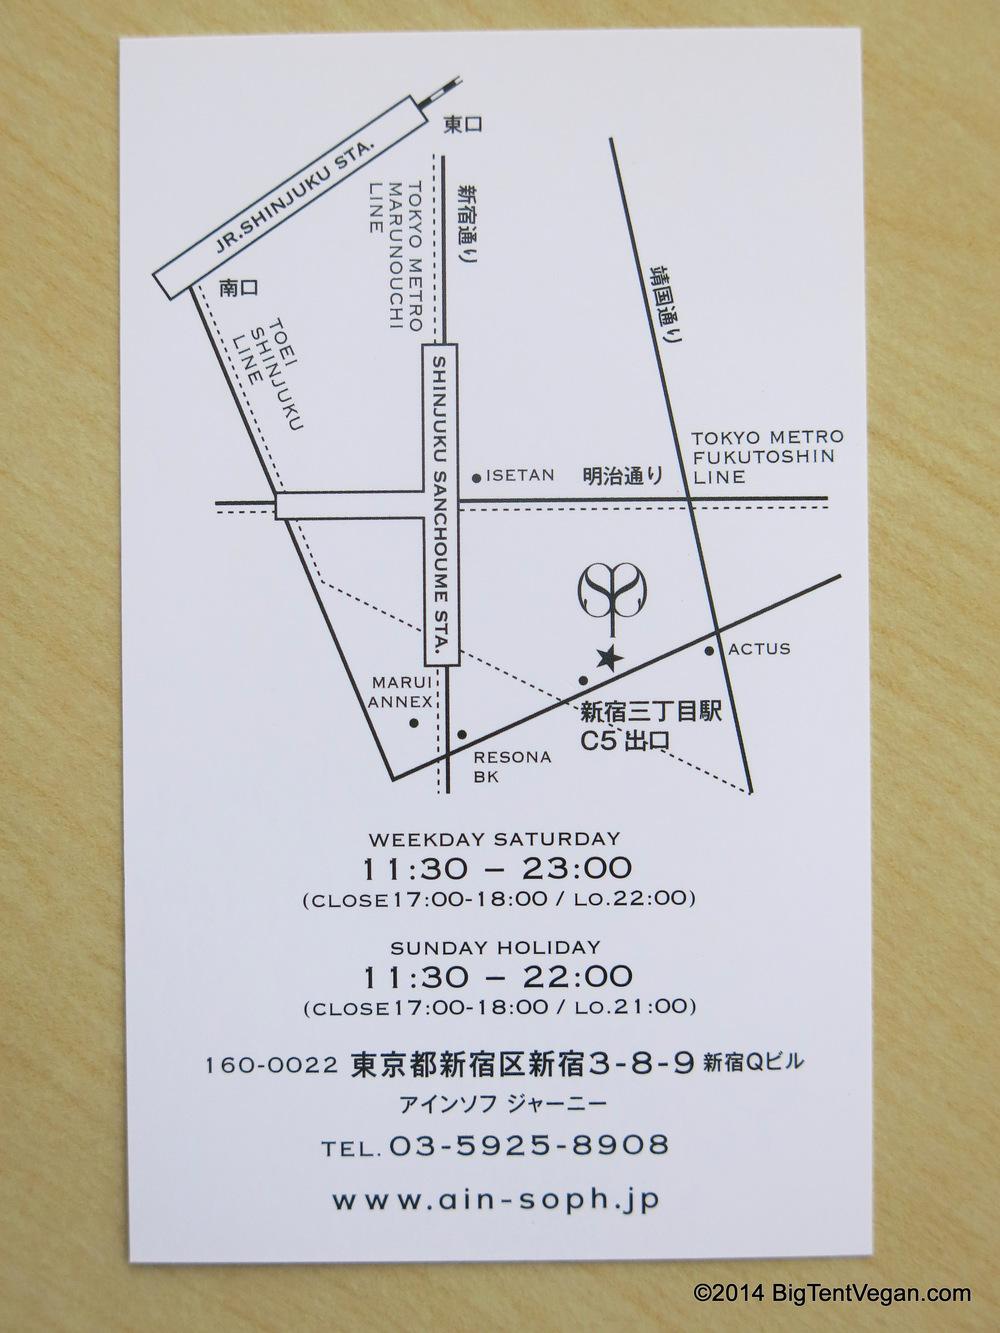 Ain Soph Journey location (Shinjuku-ku, Tokyo, Japan)